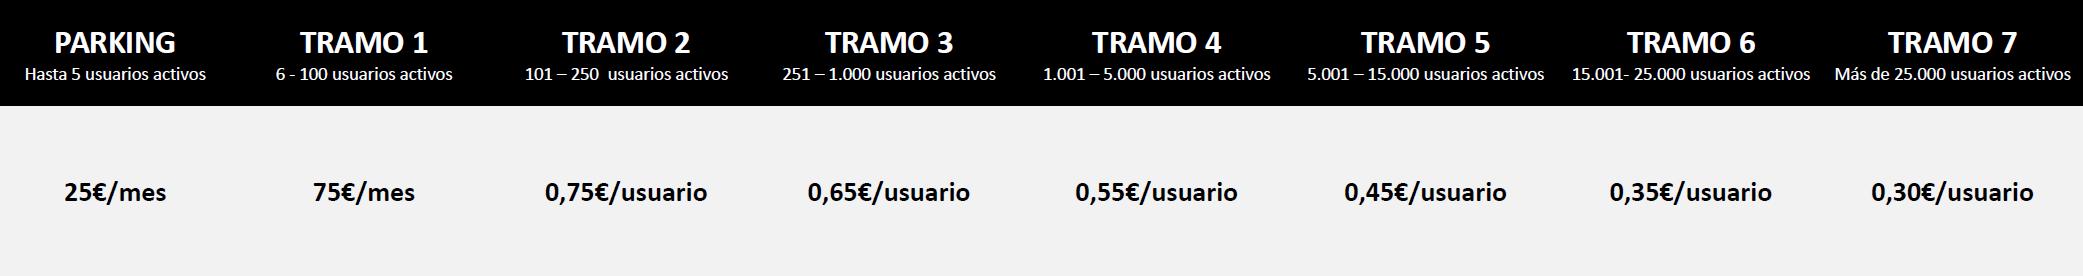 SCORM CLOUD - Tarifas por usuarios activos